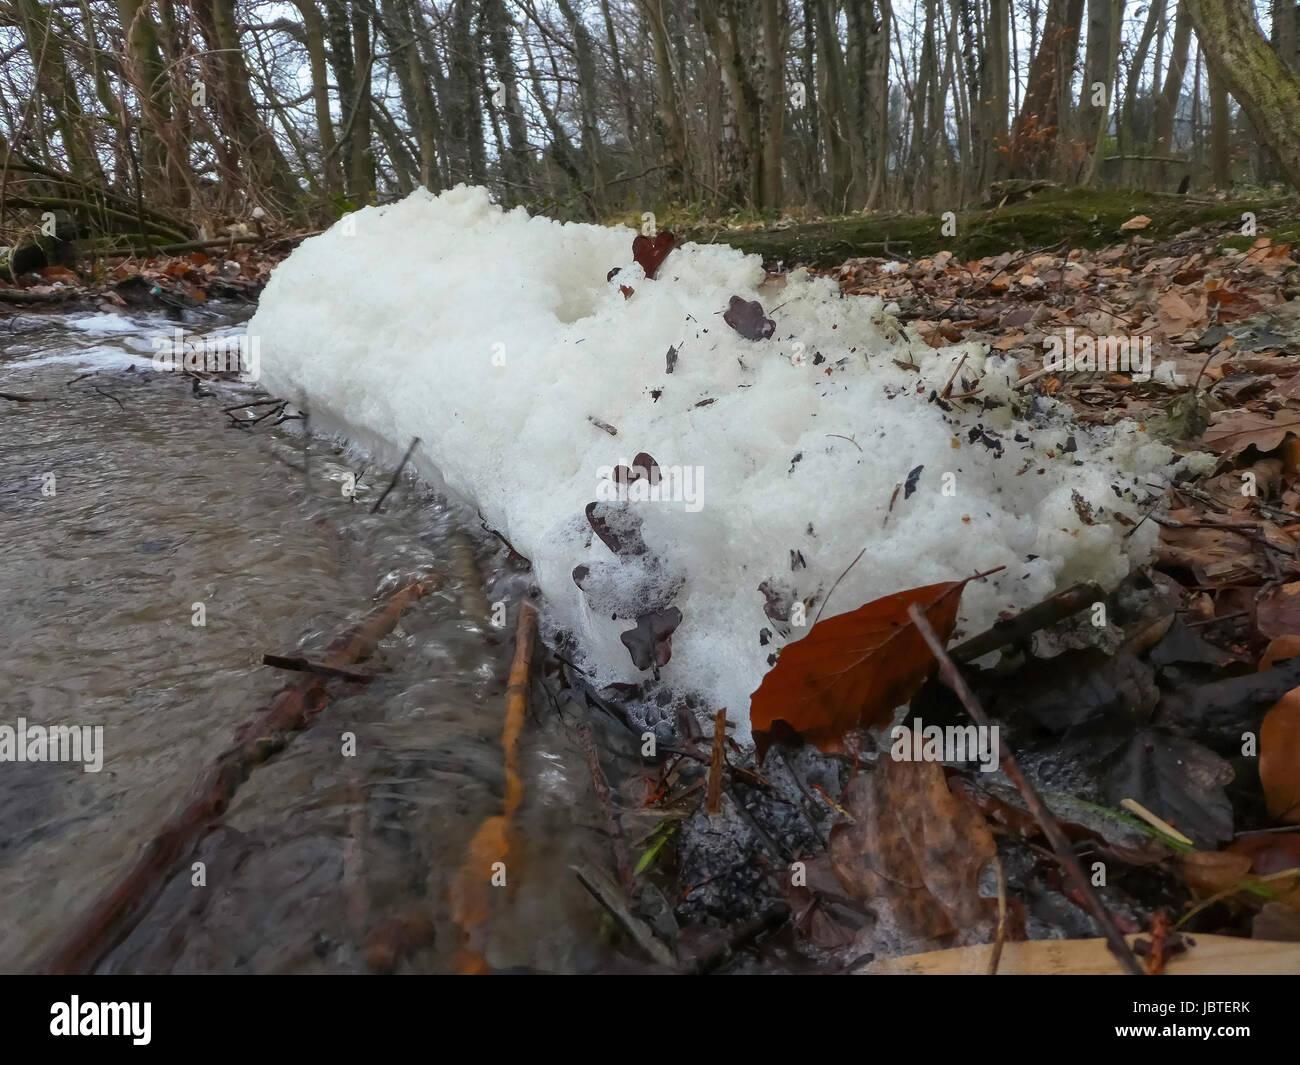 Schaum am Seeufer / foam on lake shore - Stock Image